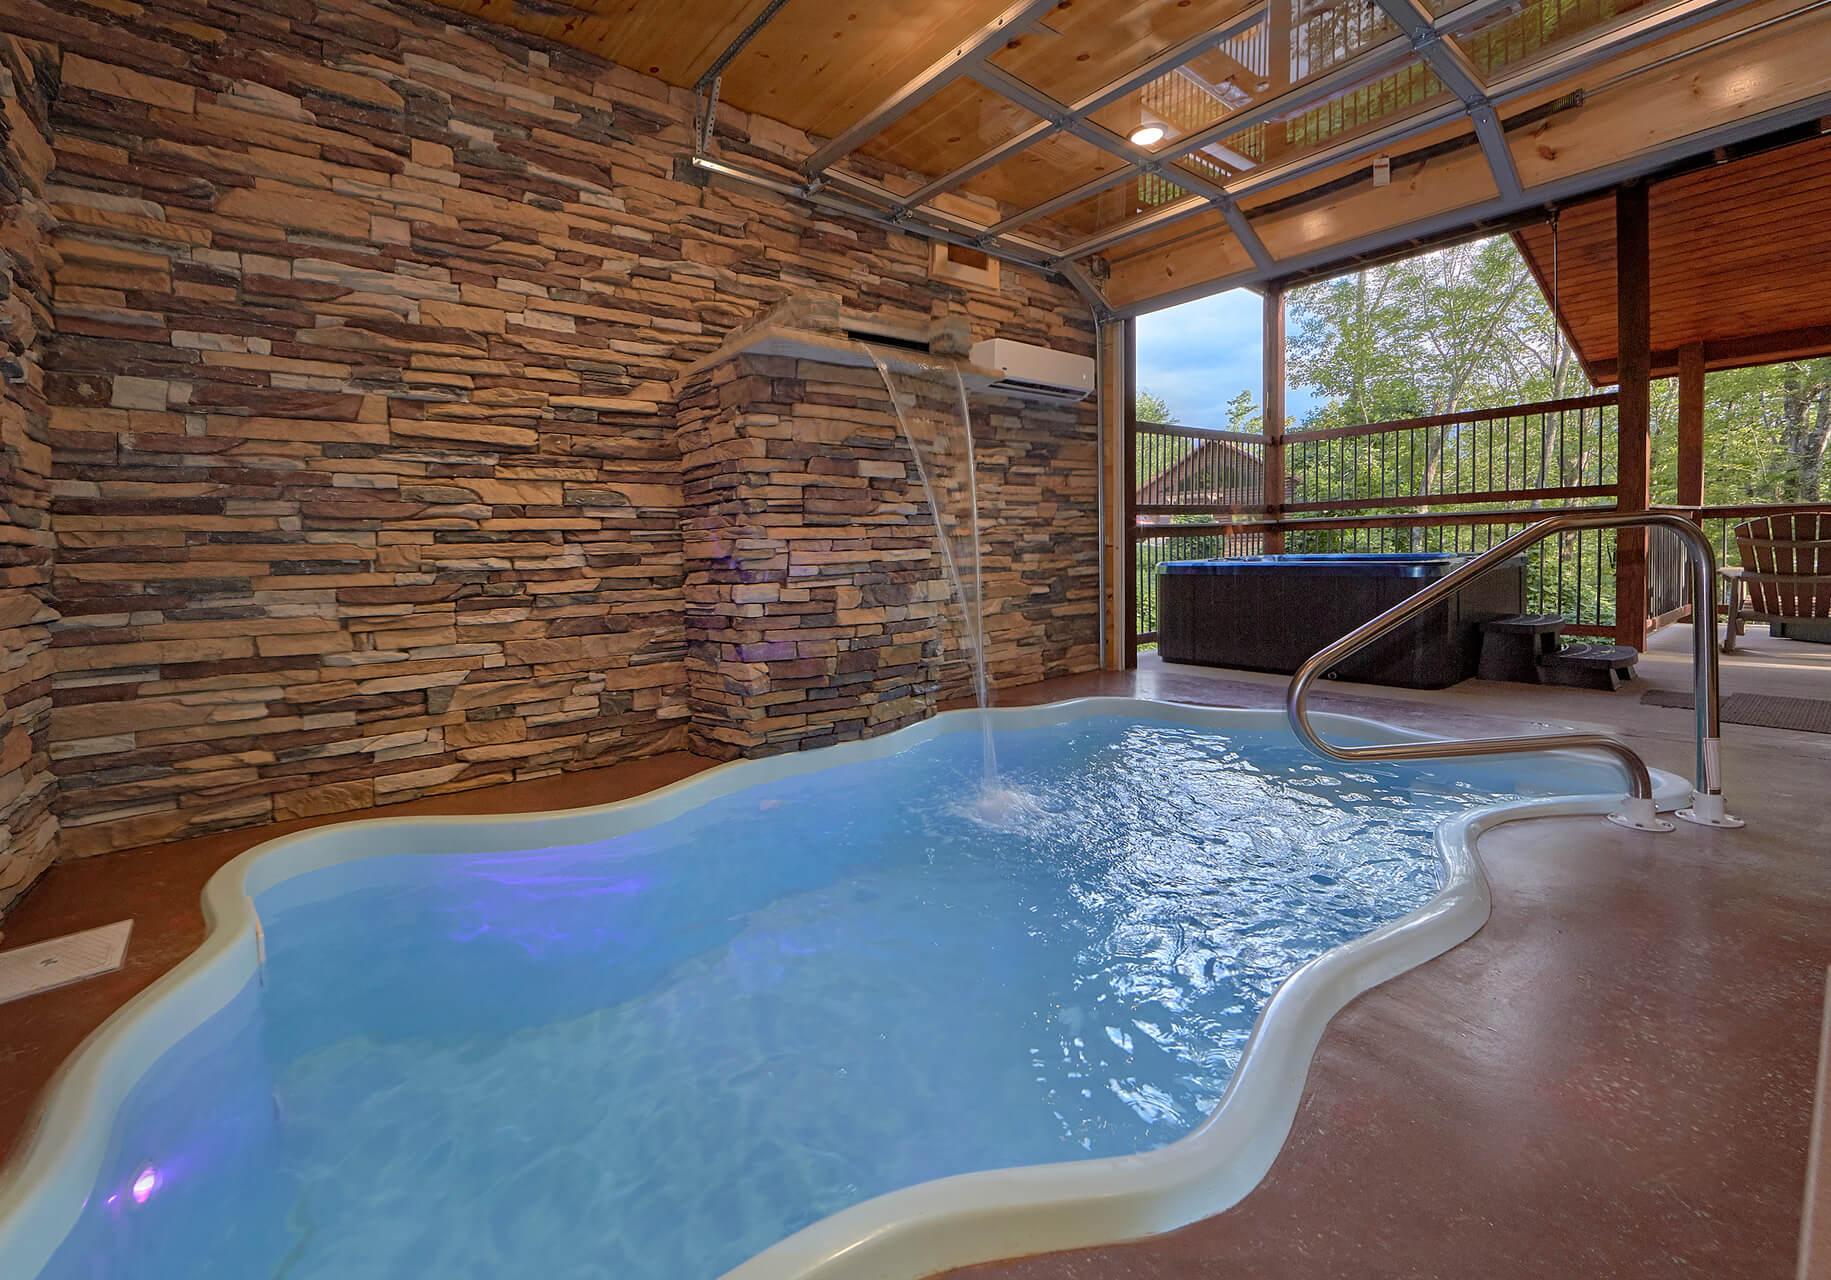 2 Bedroom Cabins In Gatlinburg TN For Rent Elk Springs